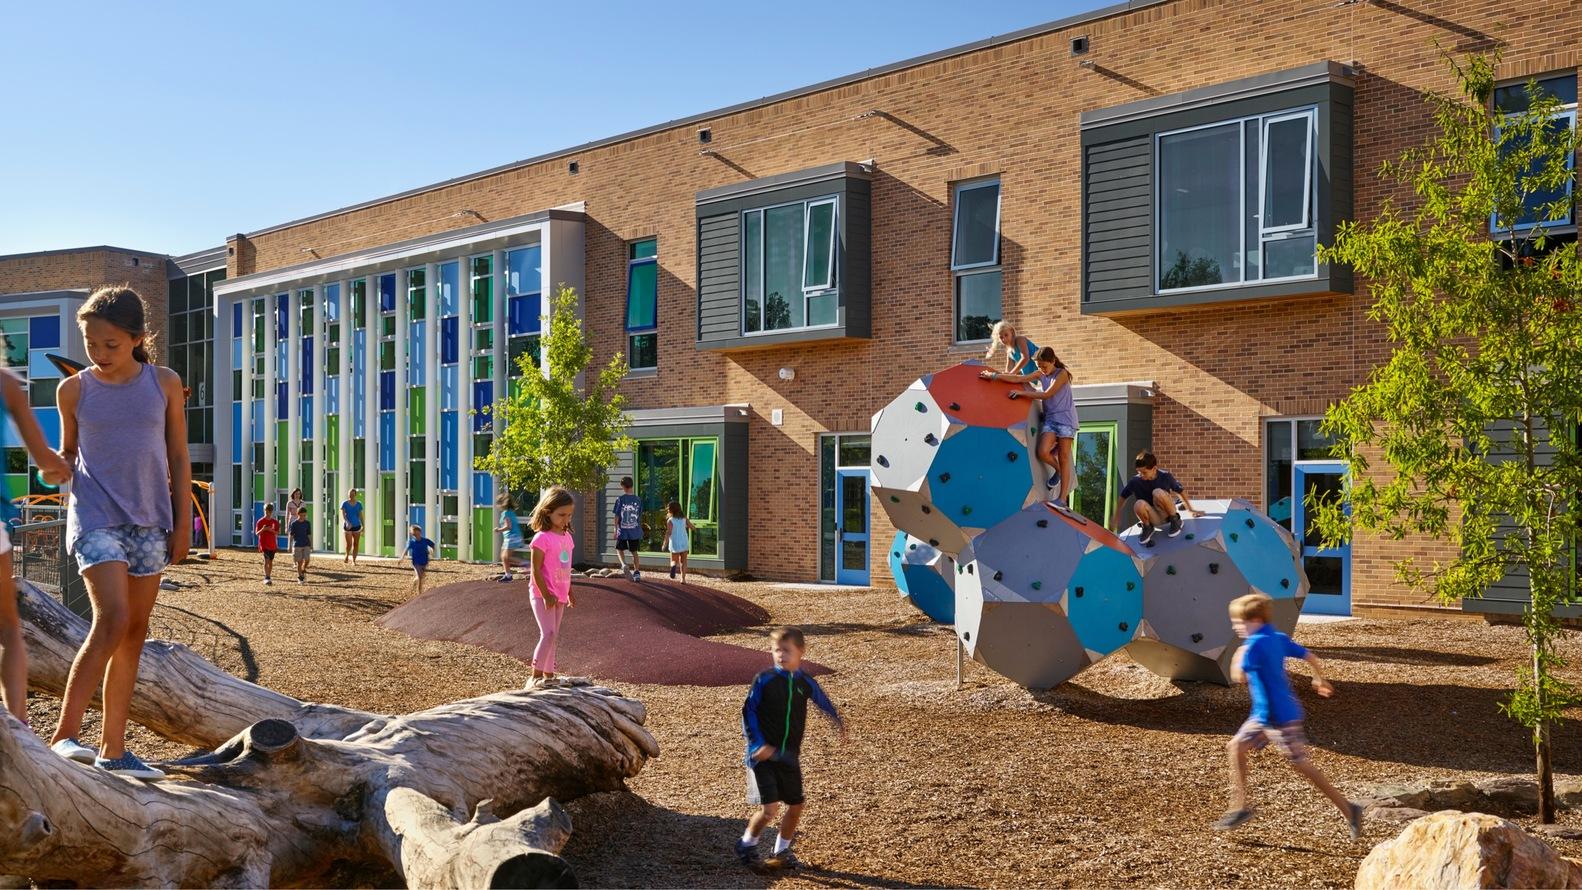 Discovery Elementary School (Arlington, Virginia – USA)